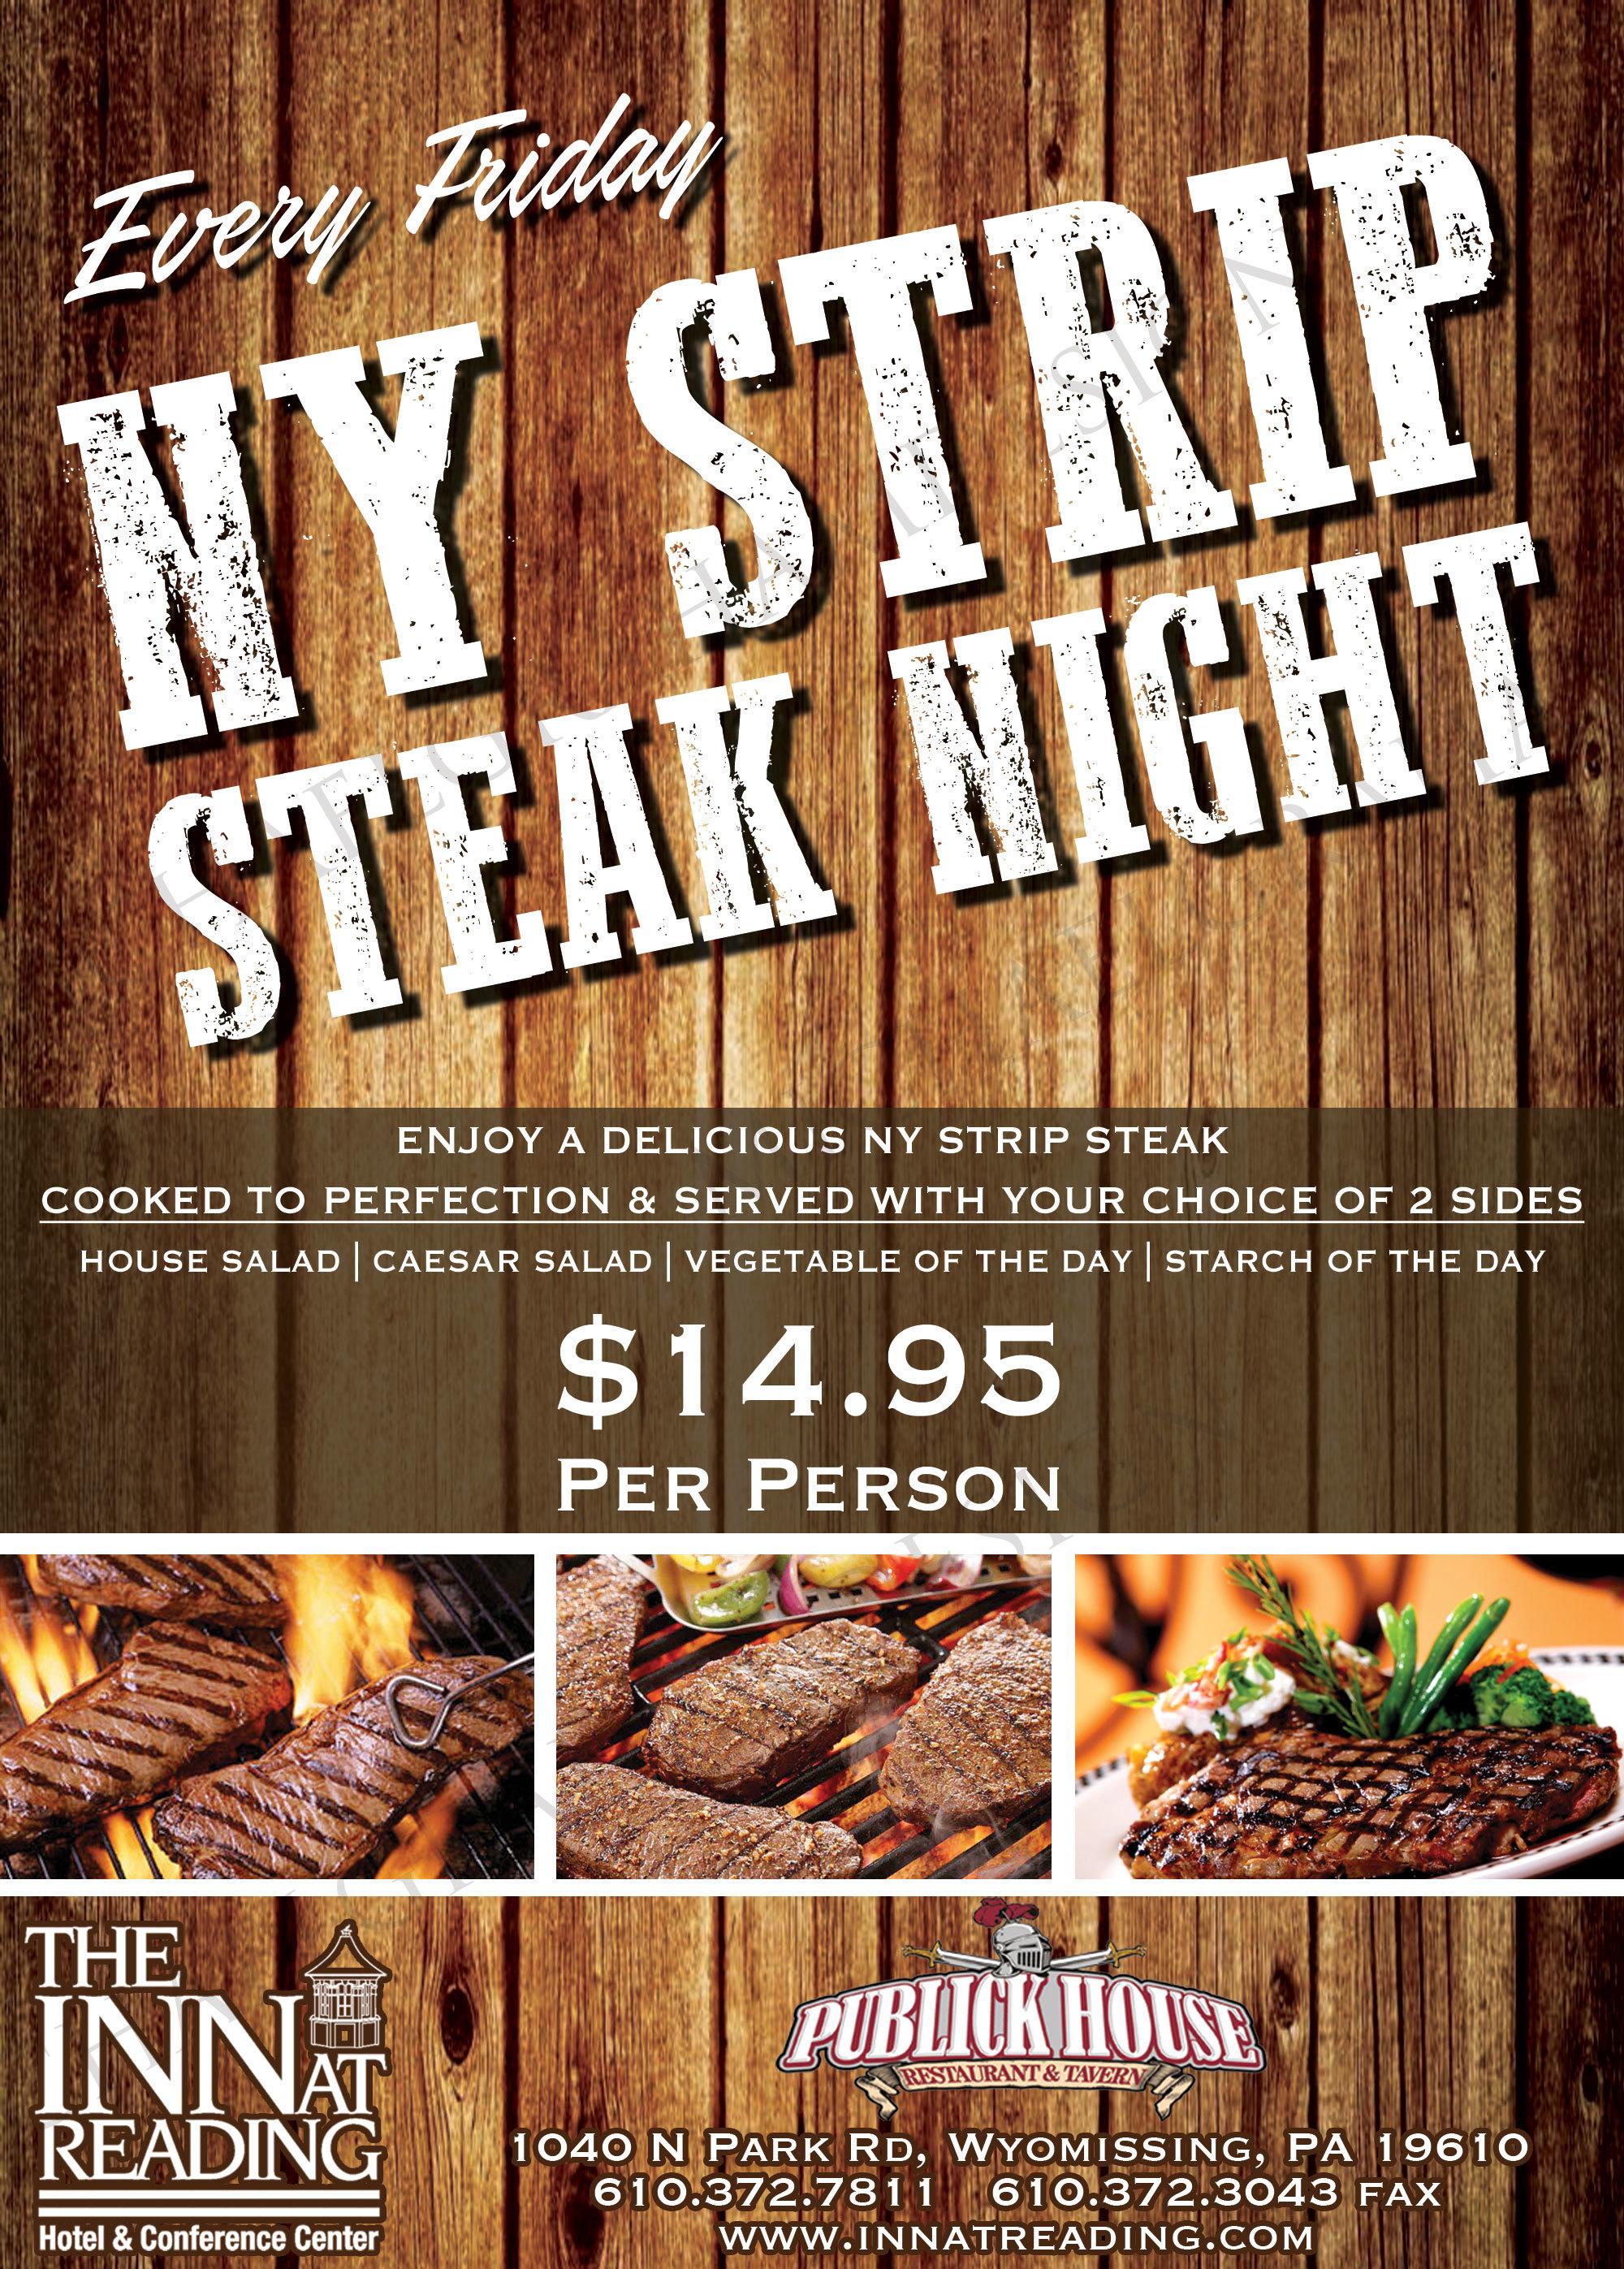 friday night steak night